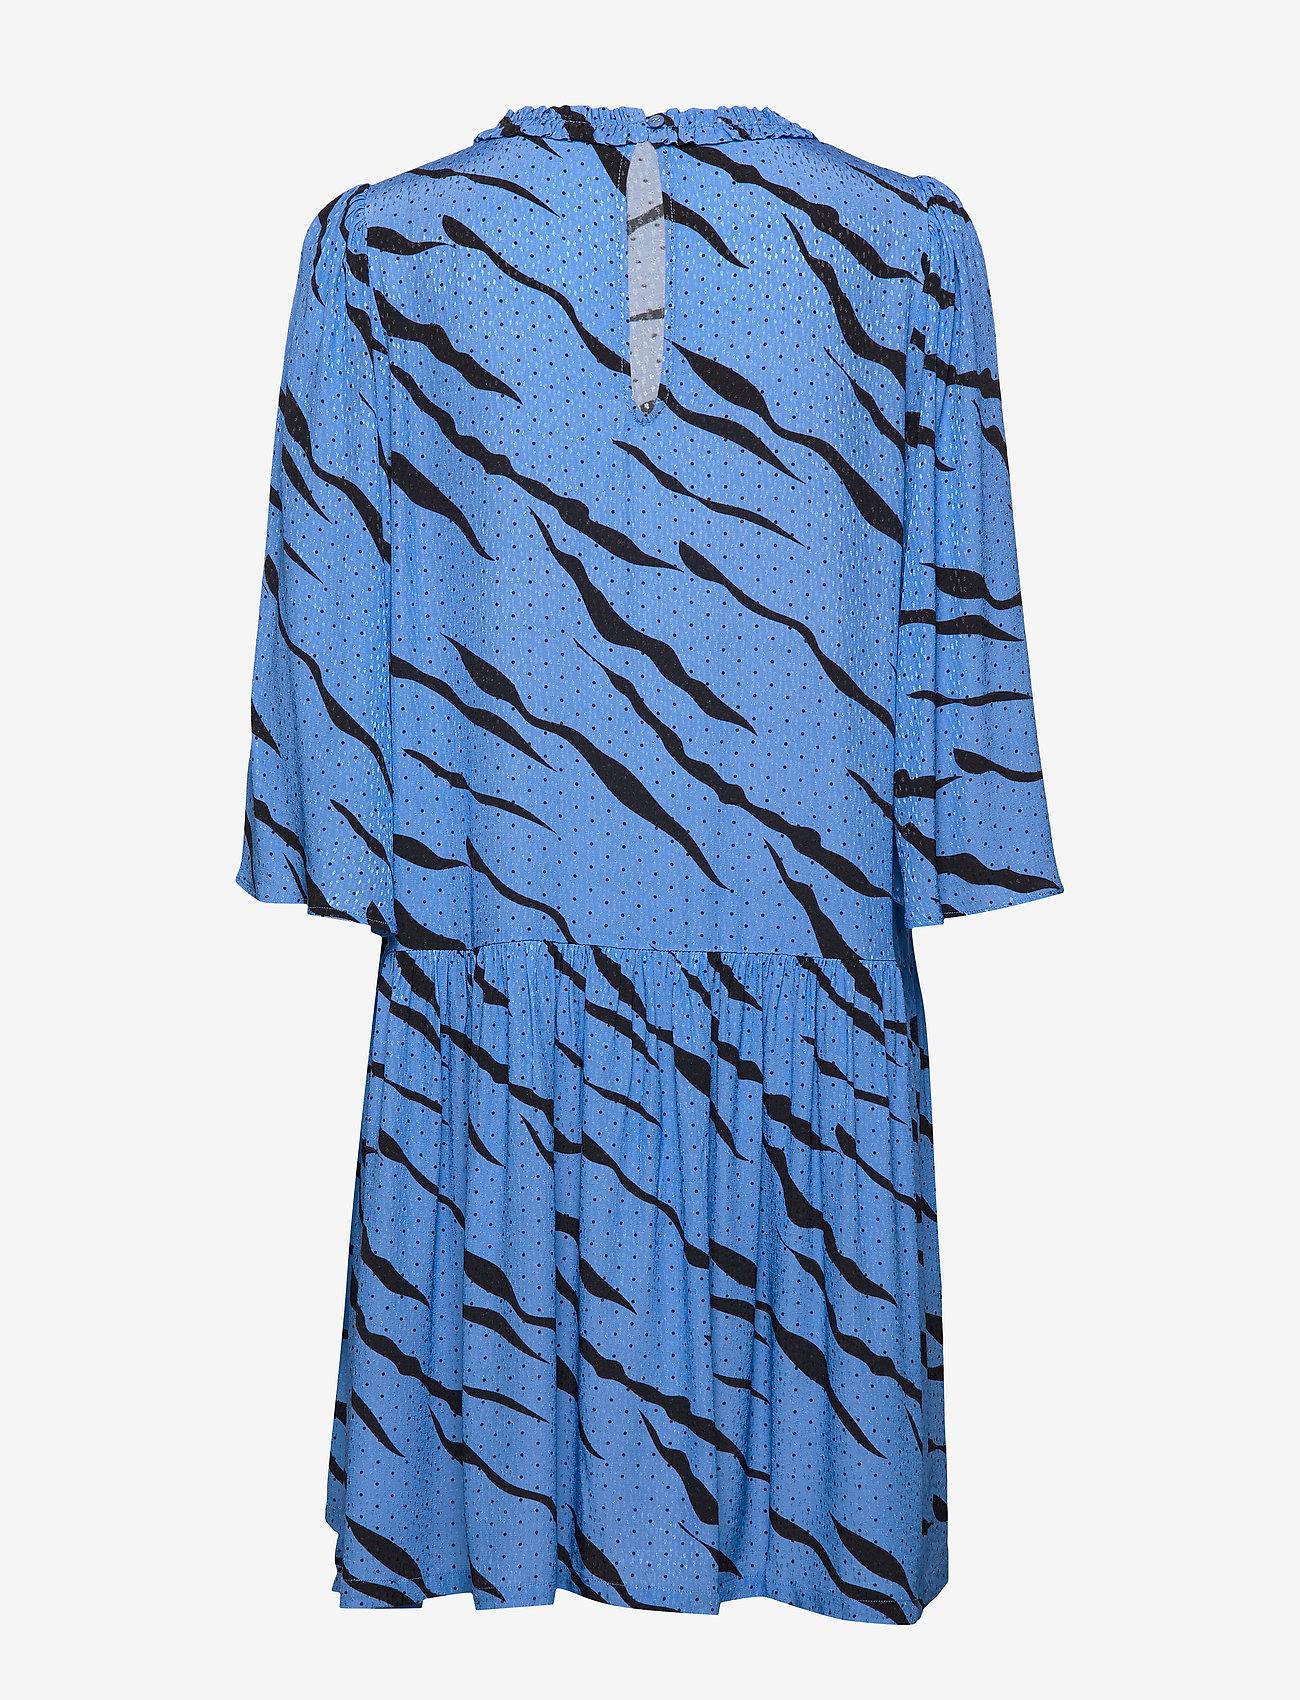 Selma (Blue Coral) (142.35 €) - Stella Nova AANiy